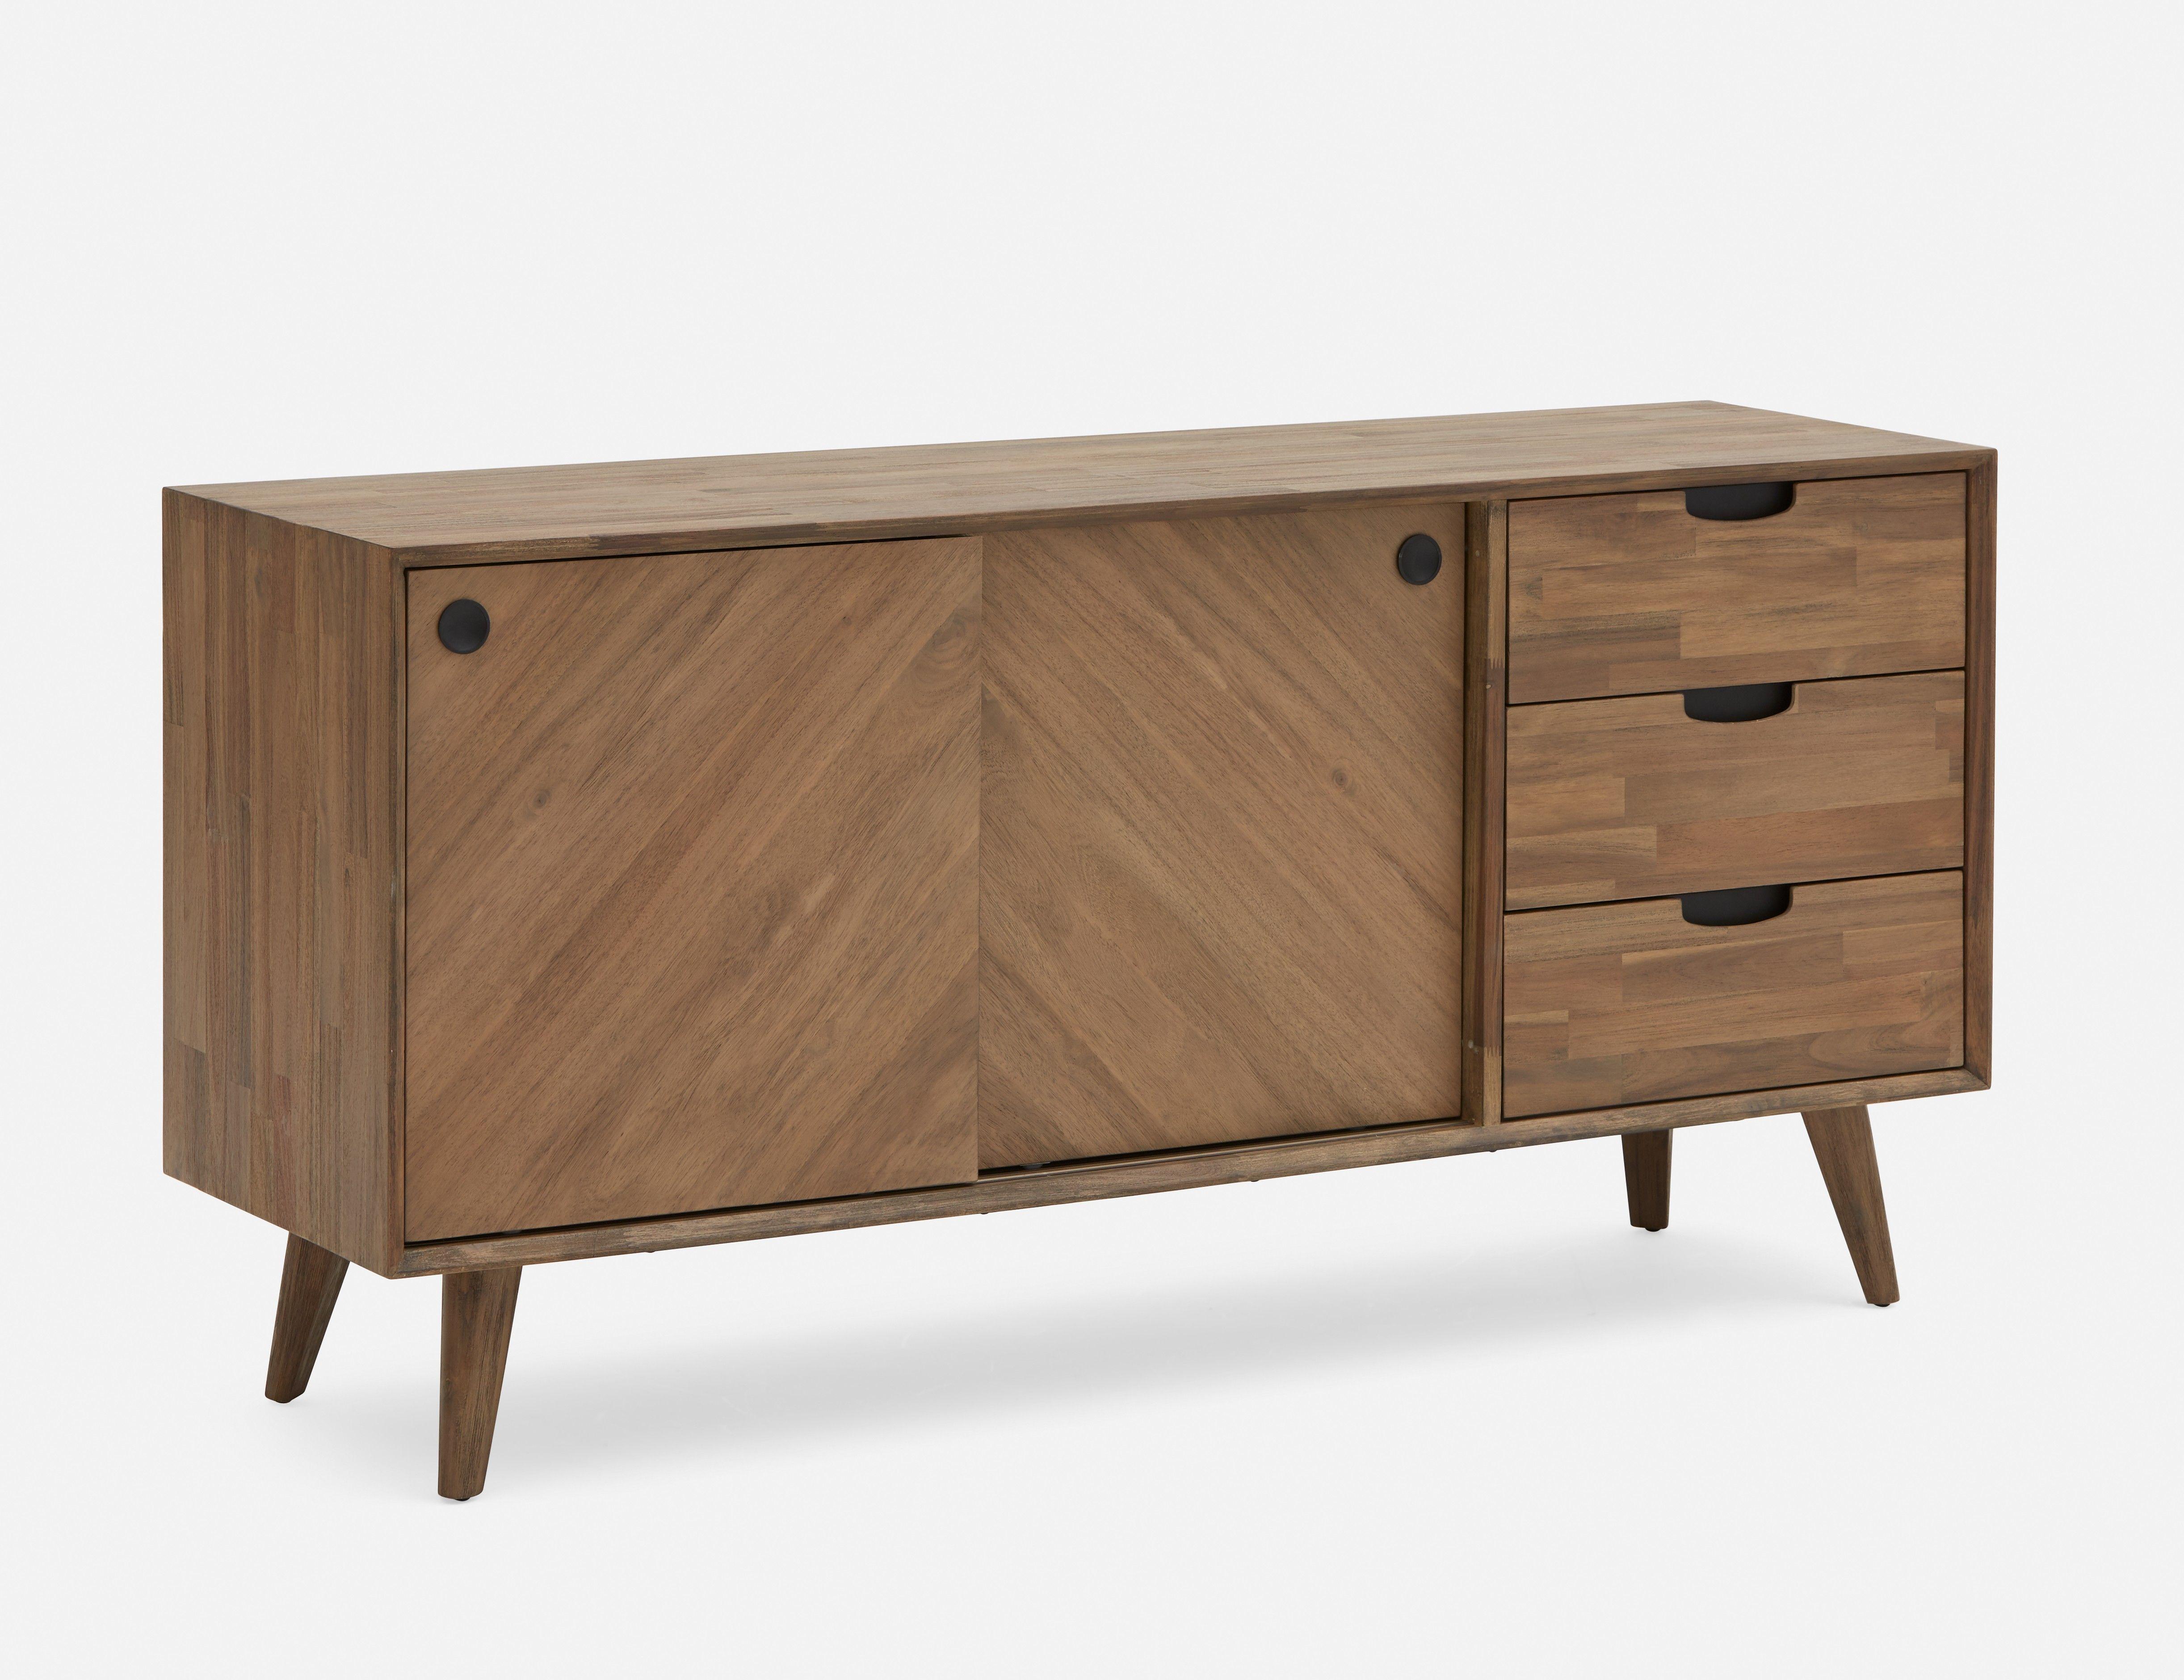 Dina Acacia Wood Multi Storage Sideboard | Random In 2019 With Regard To Keiko Modern Bookmatch Sideboards (Gallery 8 of 30)